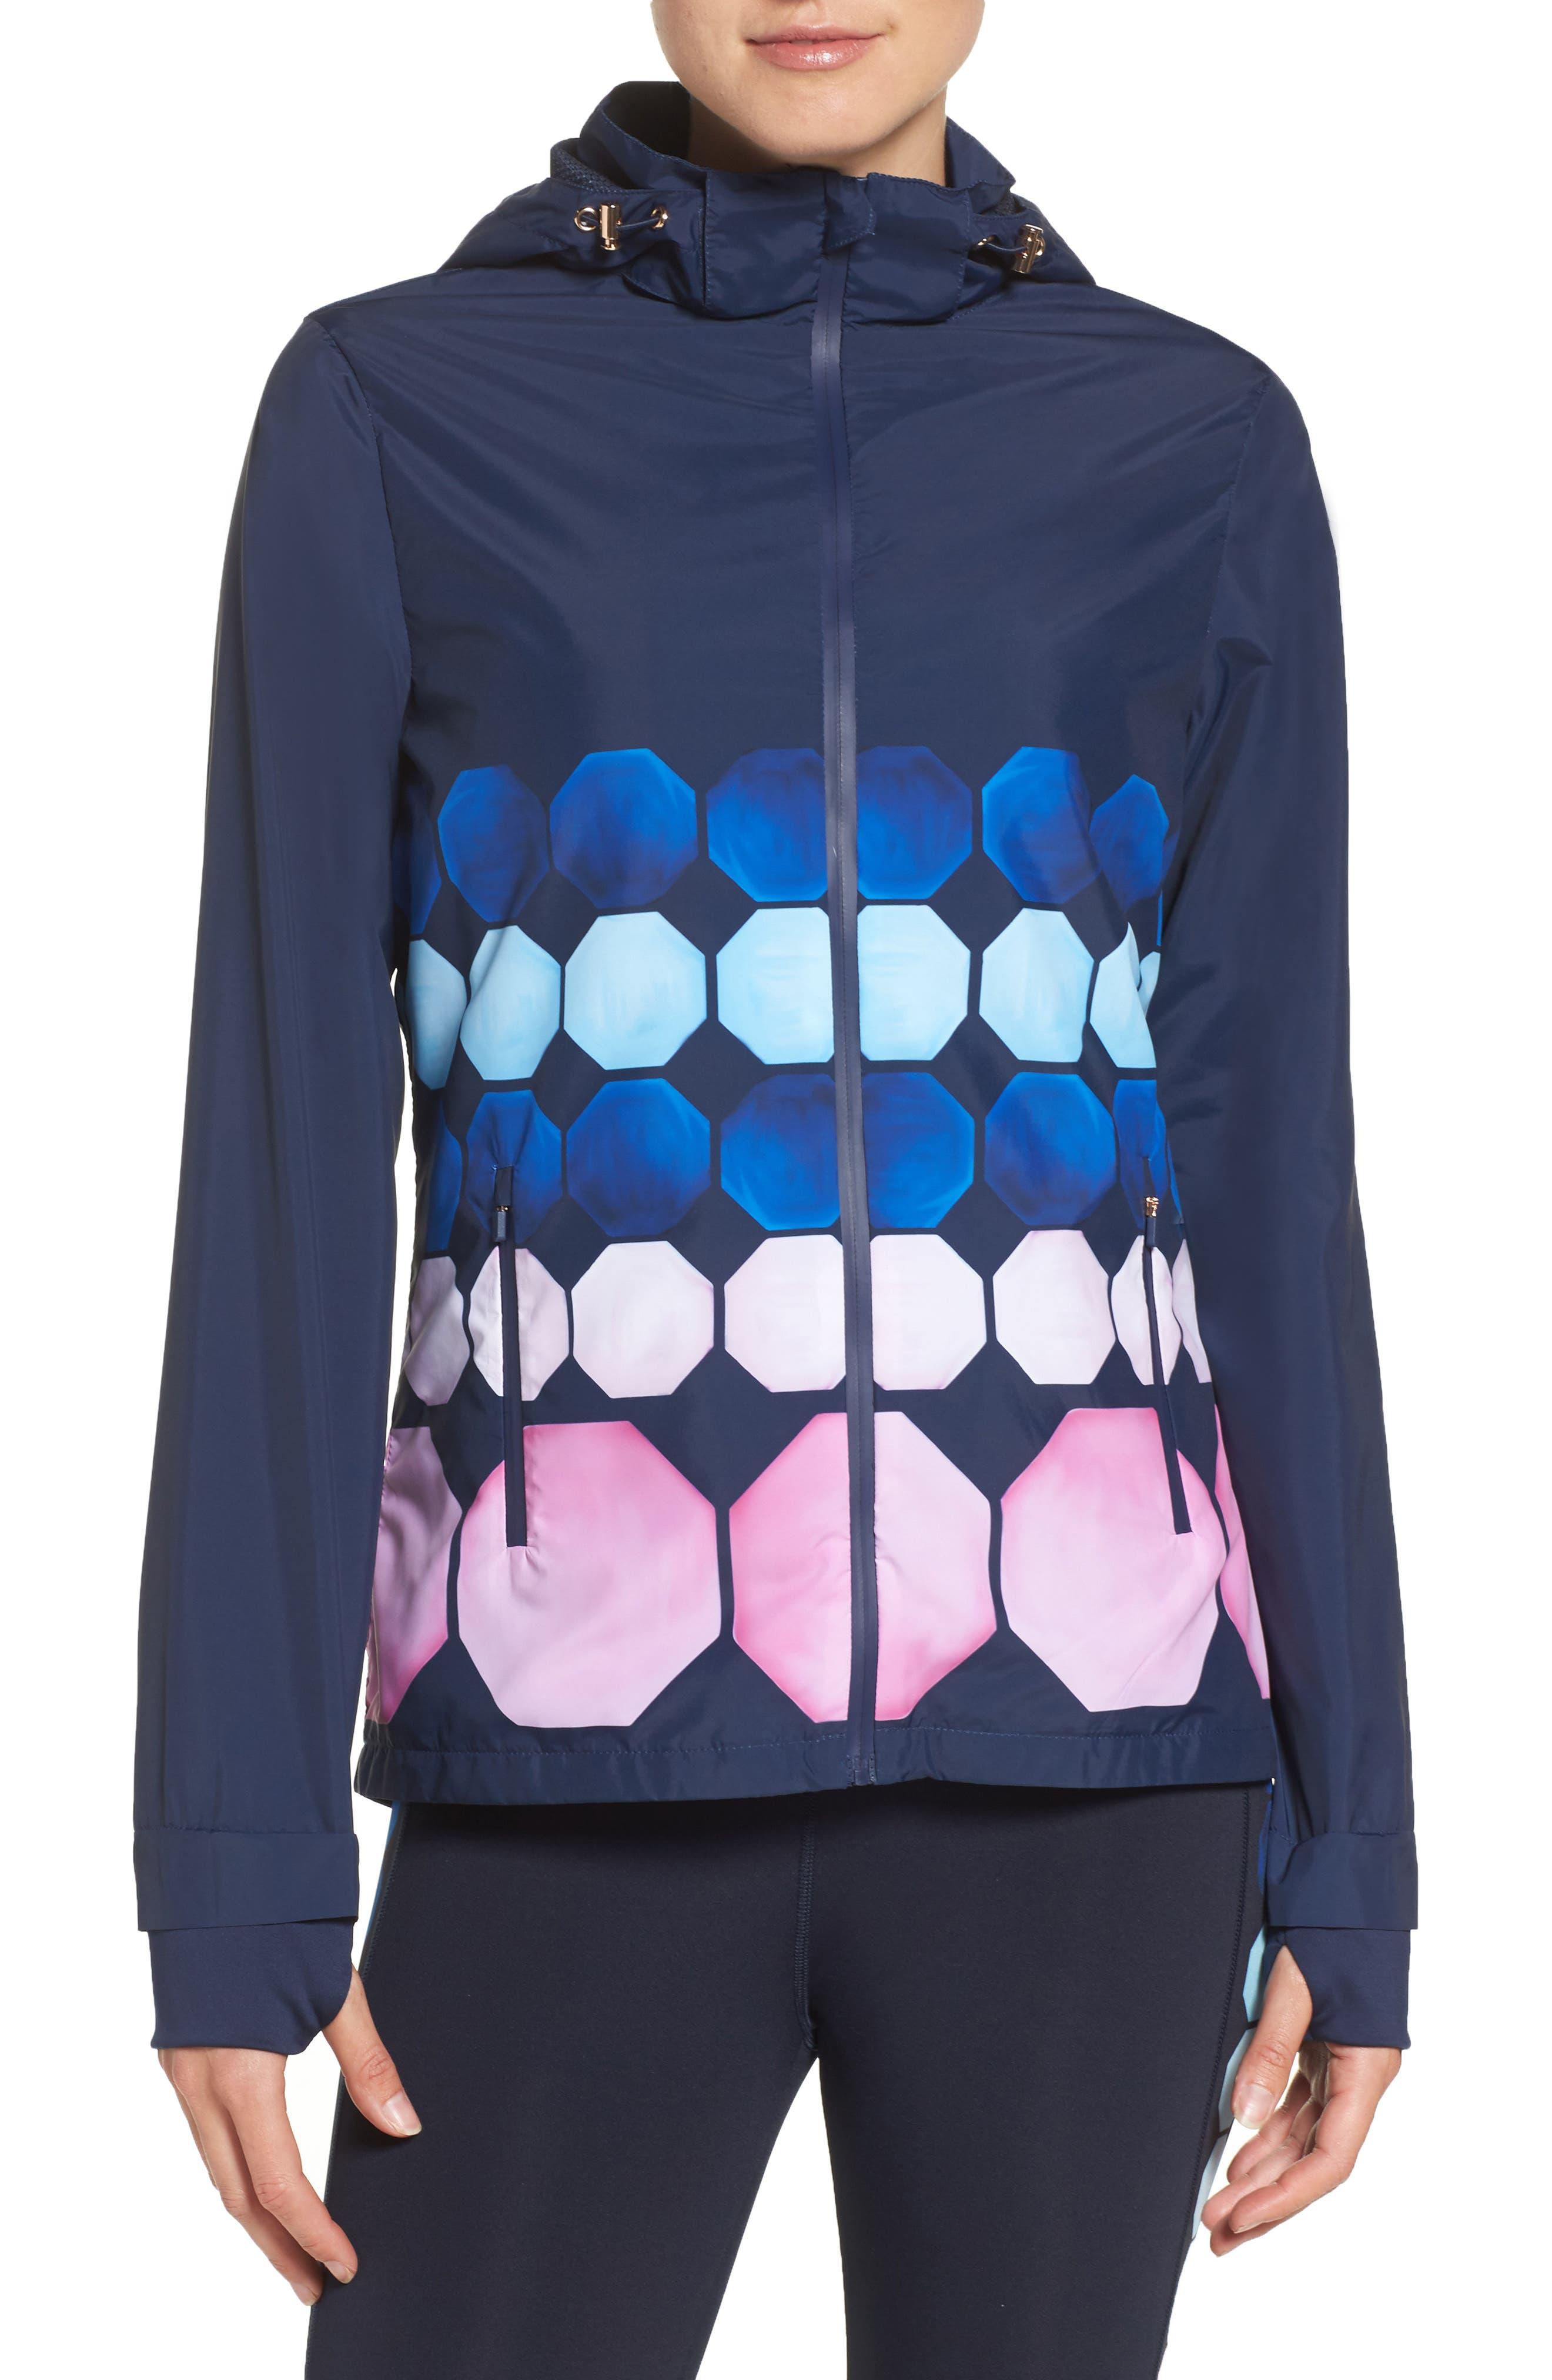 Marina Mosaic Hooded Jacket,                         Main,                         color, Navy